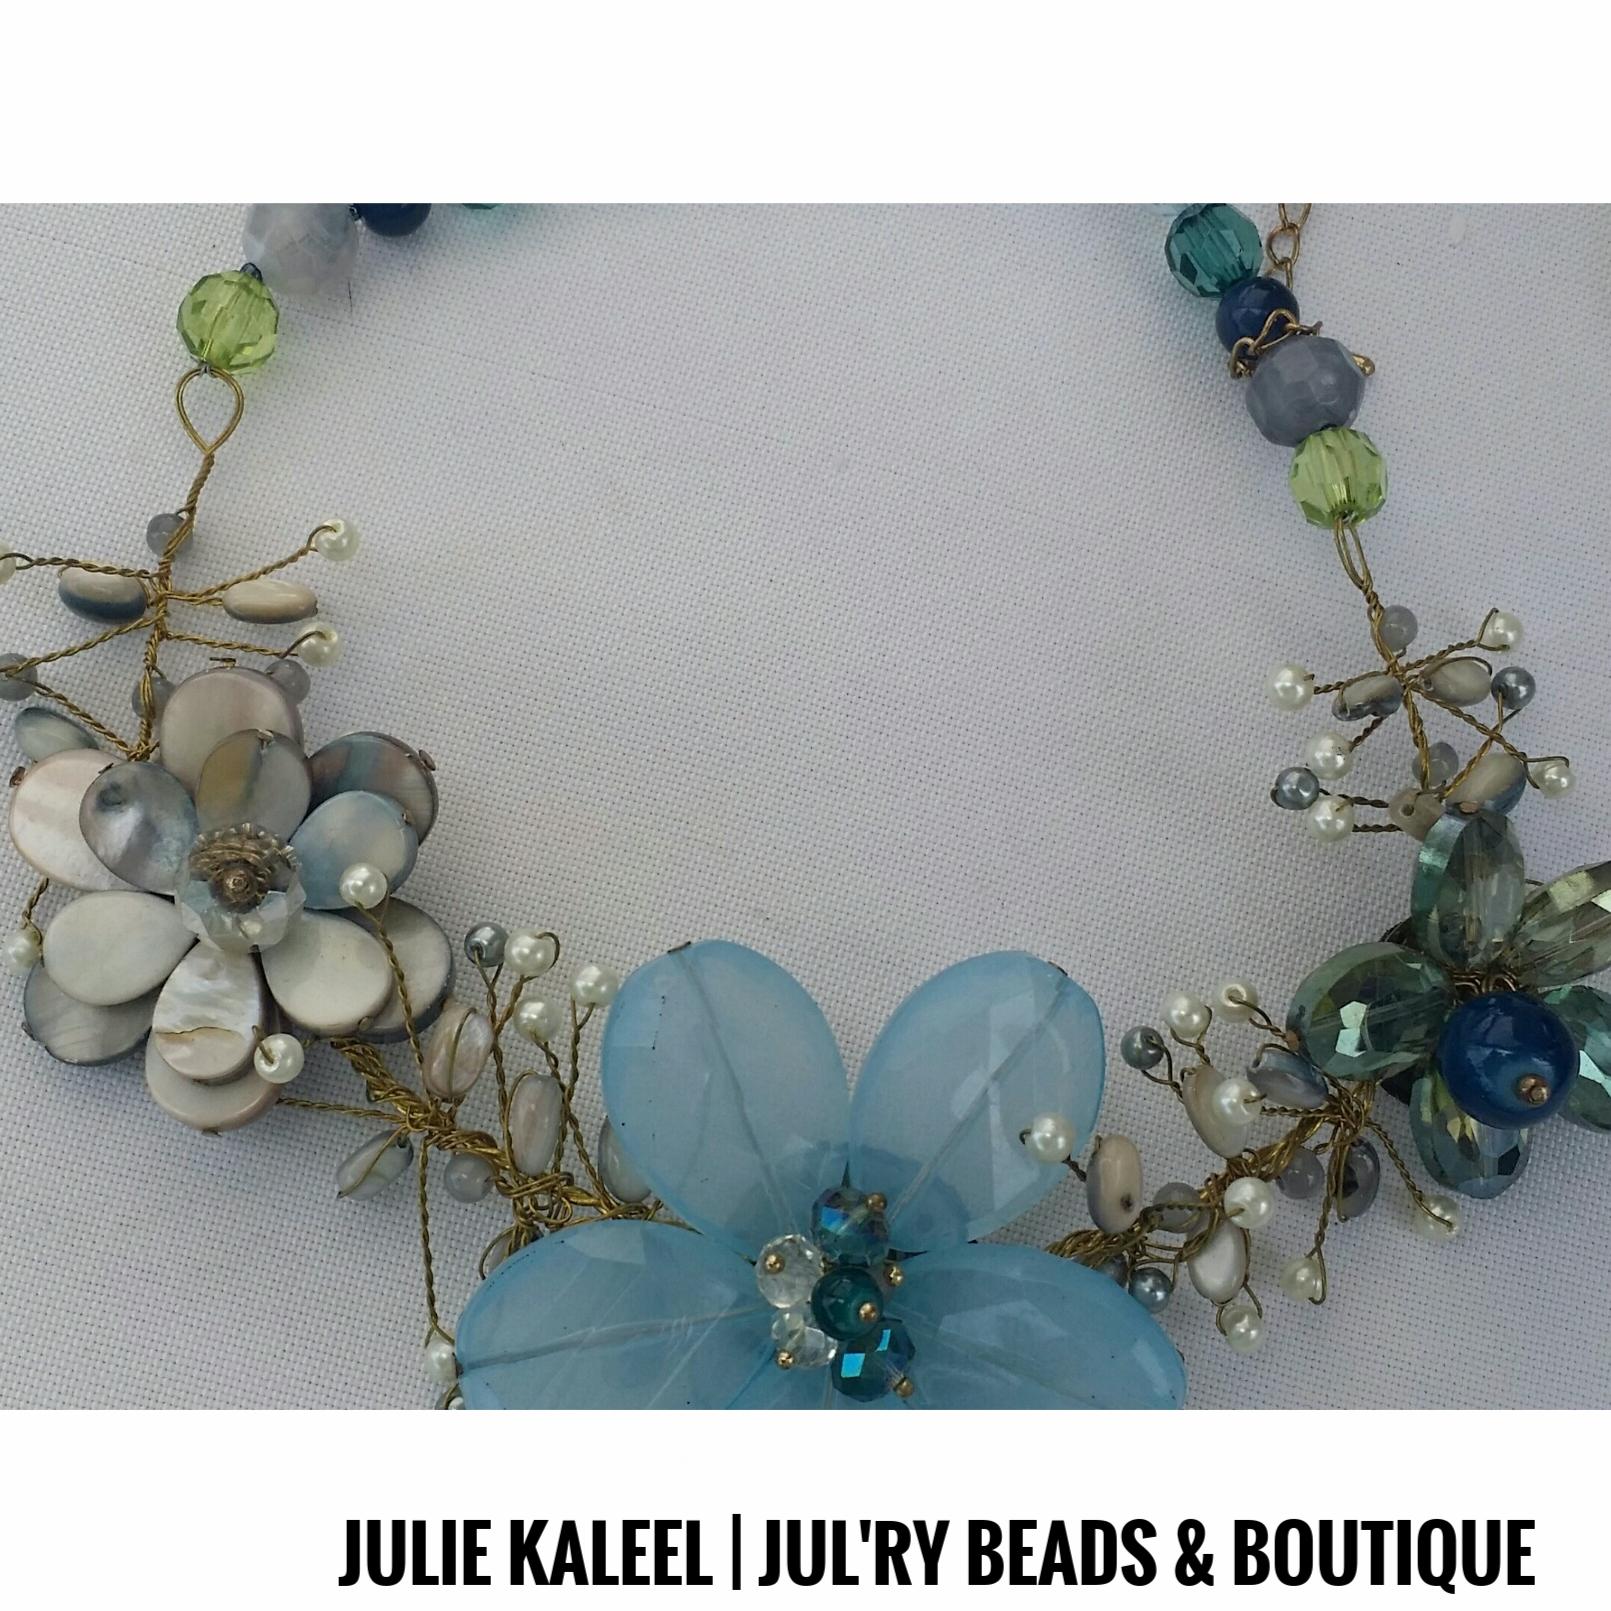 Julie Kaleel | Jul'ry Beads & Boutique